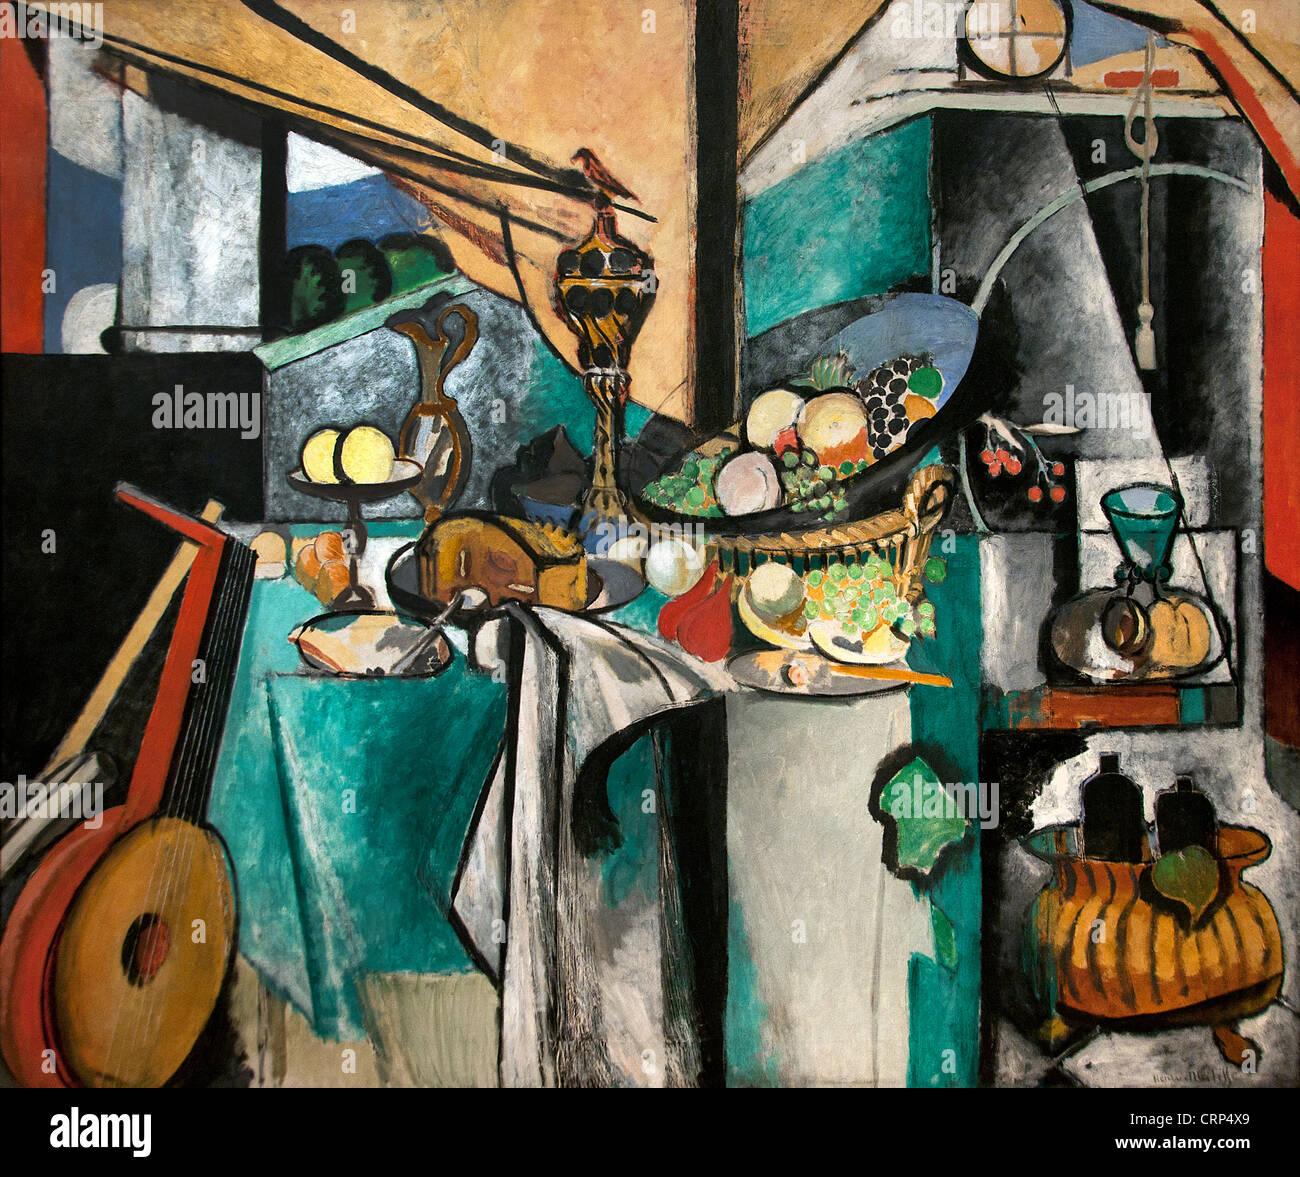 Still Life after Jan Davidsz. de Heem's La Desserte - the trolley 1915  Henri Matisse France French Painter Stock Photo